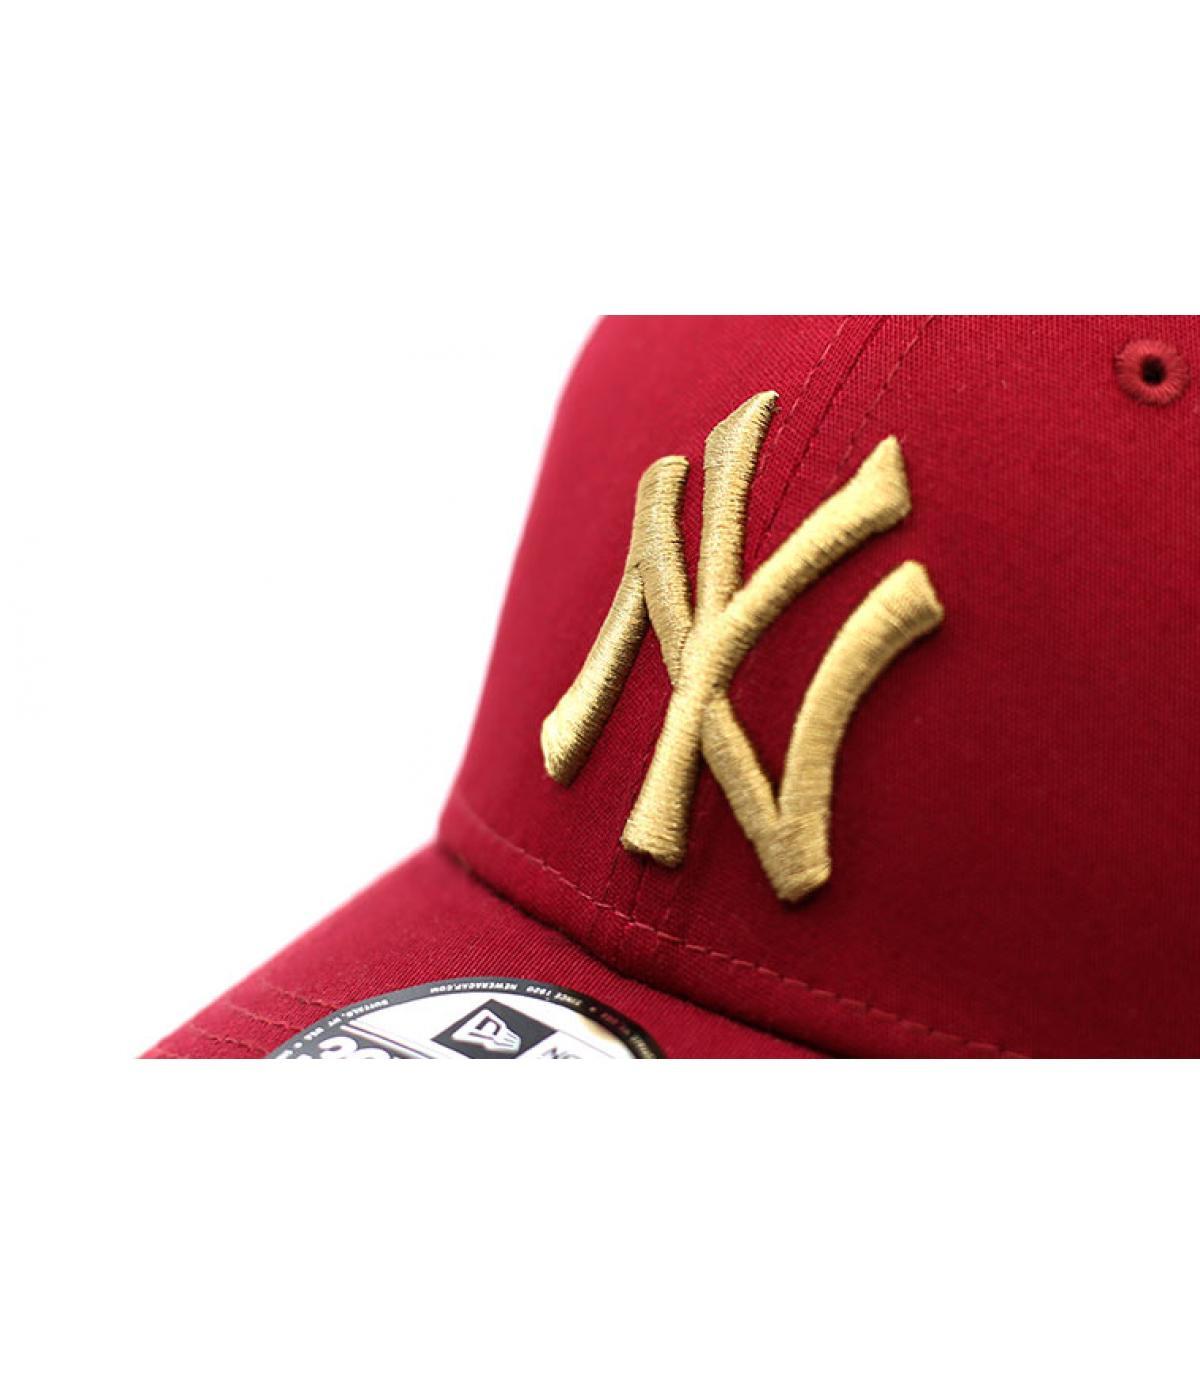 Details Cap League Ess NY 3930 cardinal wheat - Abbildung 3